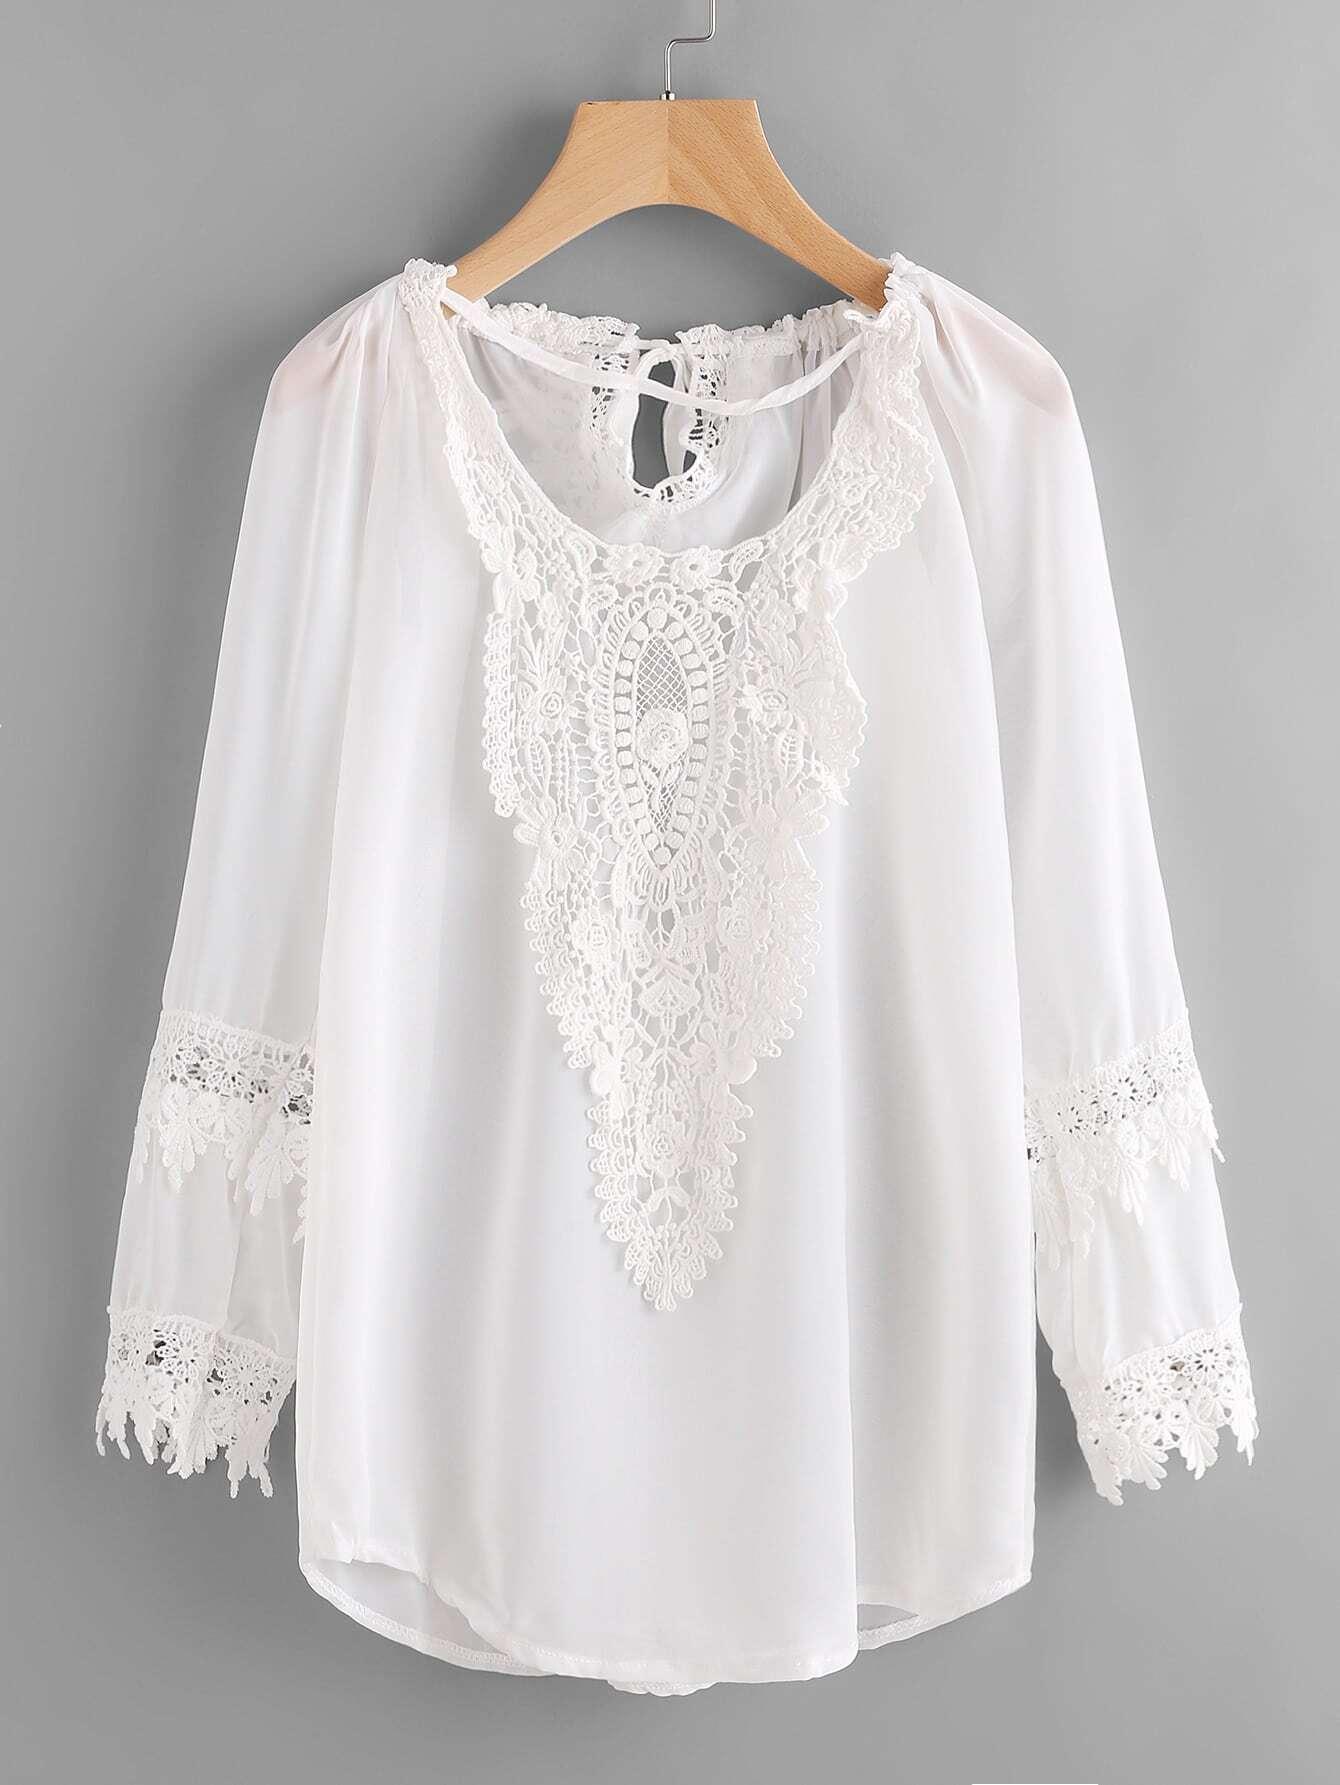 blouse170522335_2